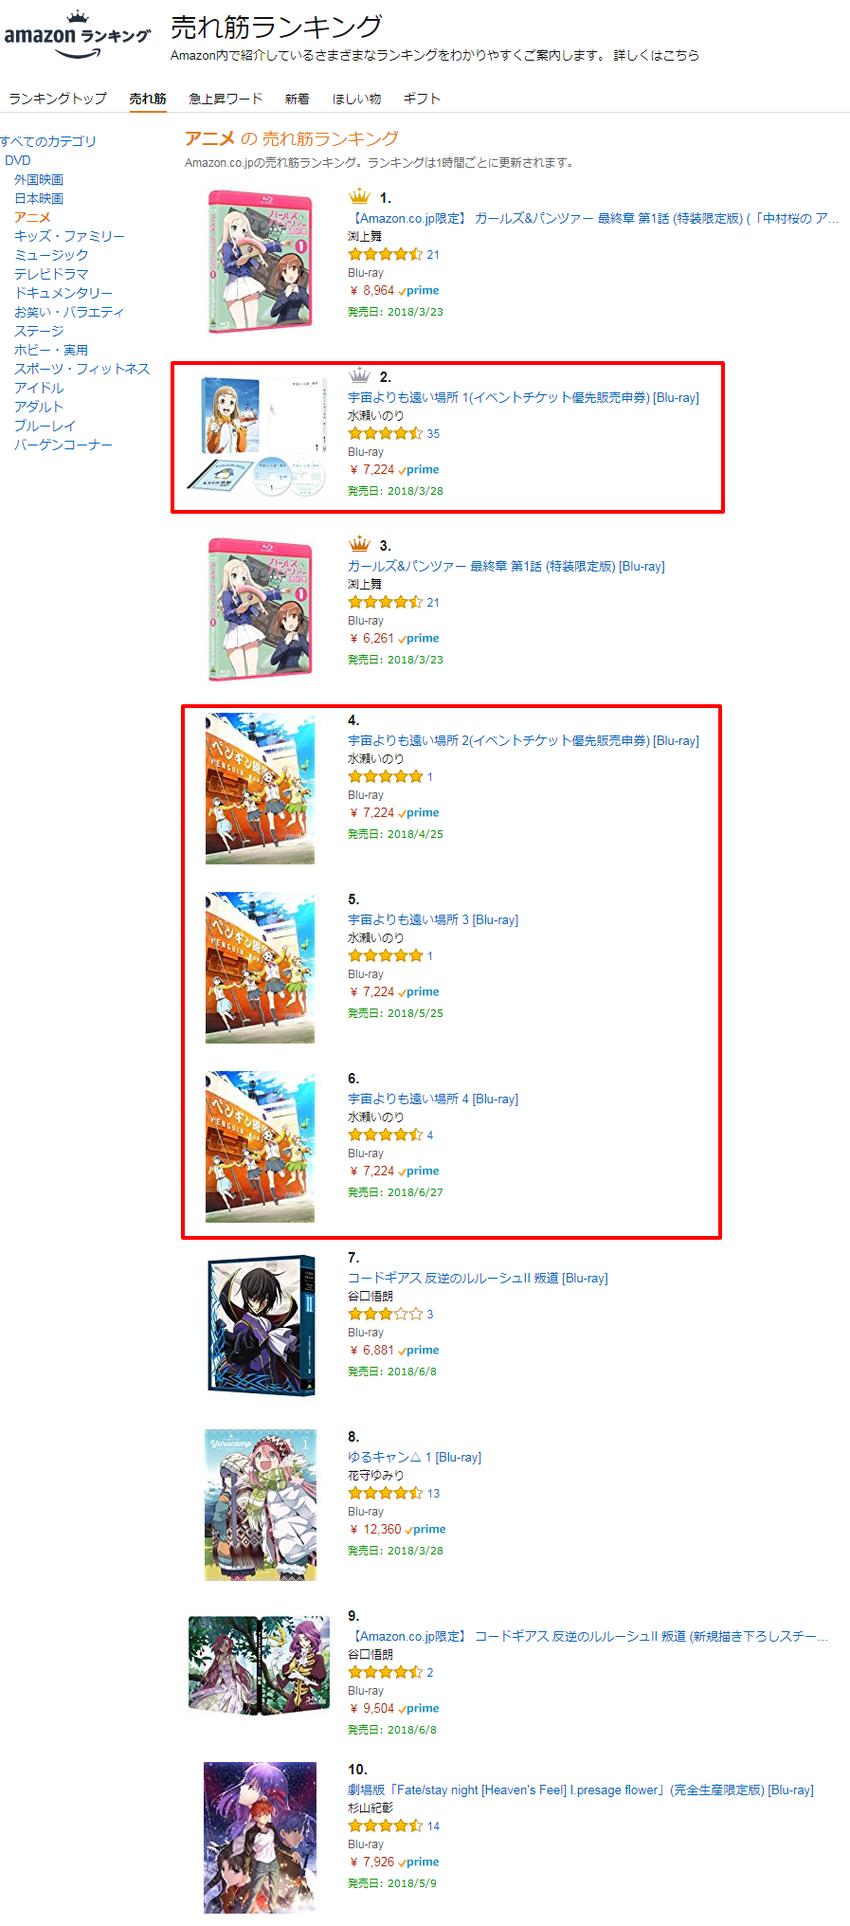 Amazon co jp 売れ筋ランキング